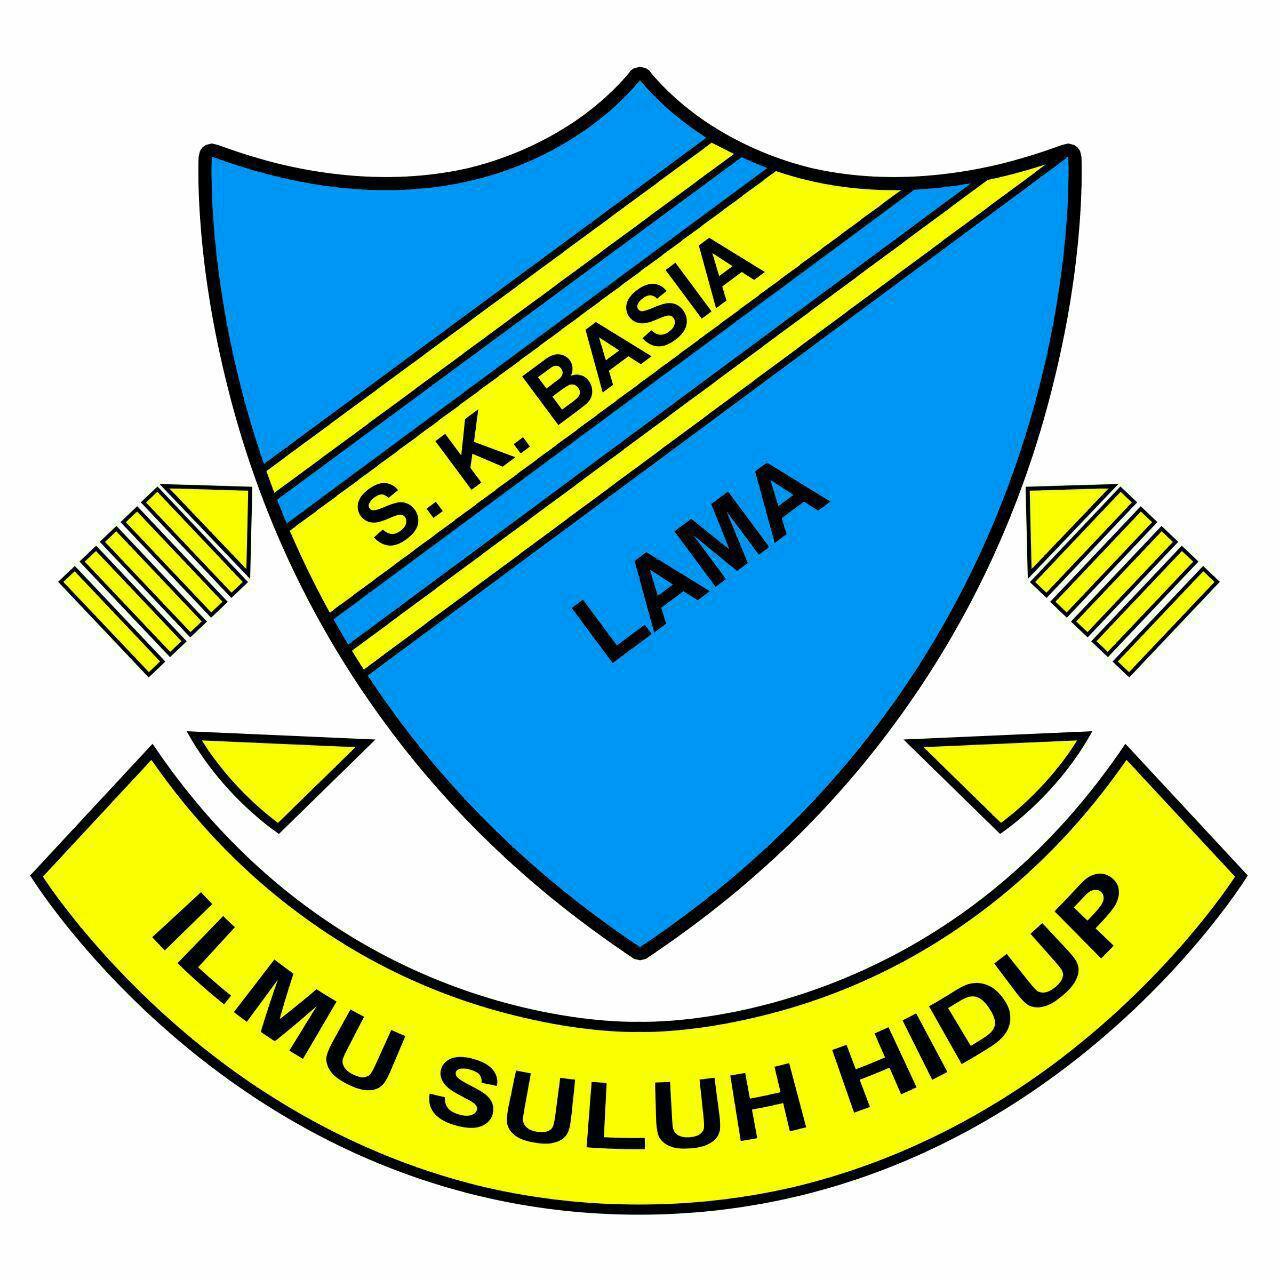 SK BASIA LAMA